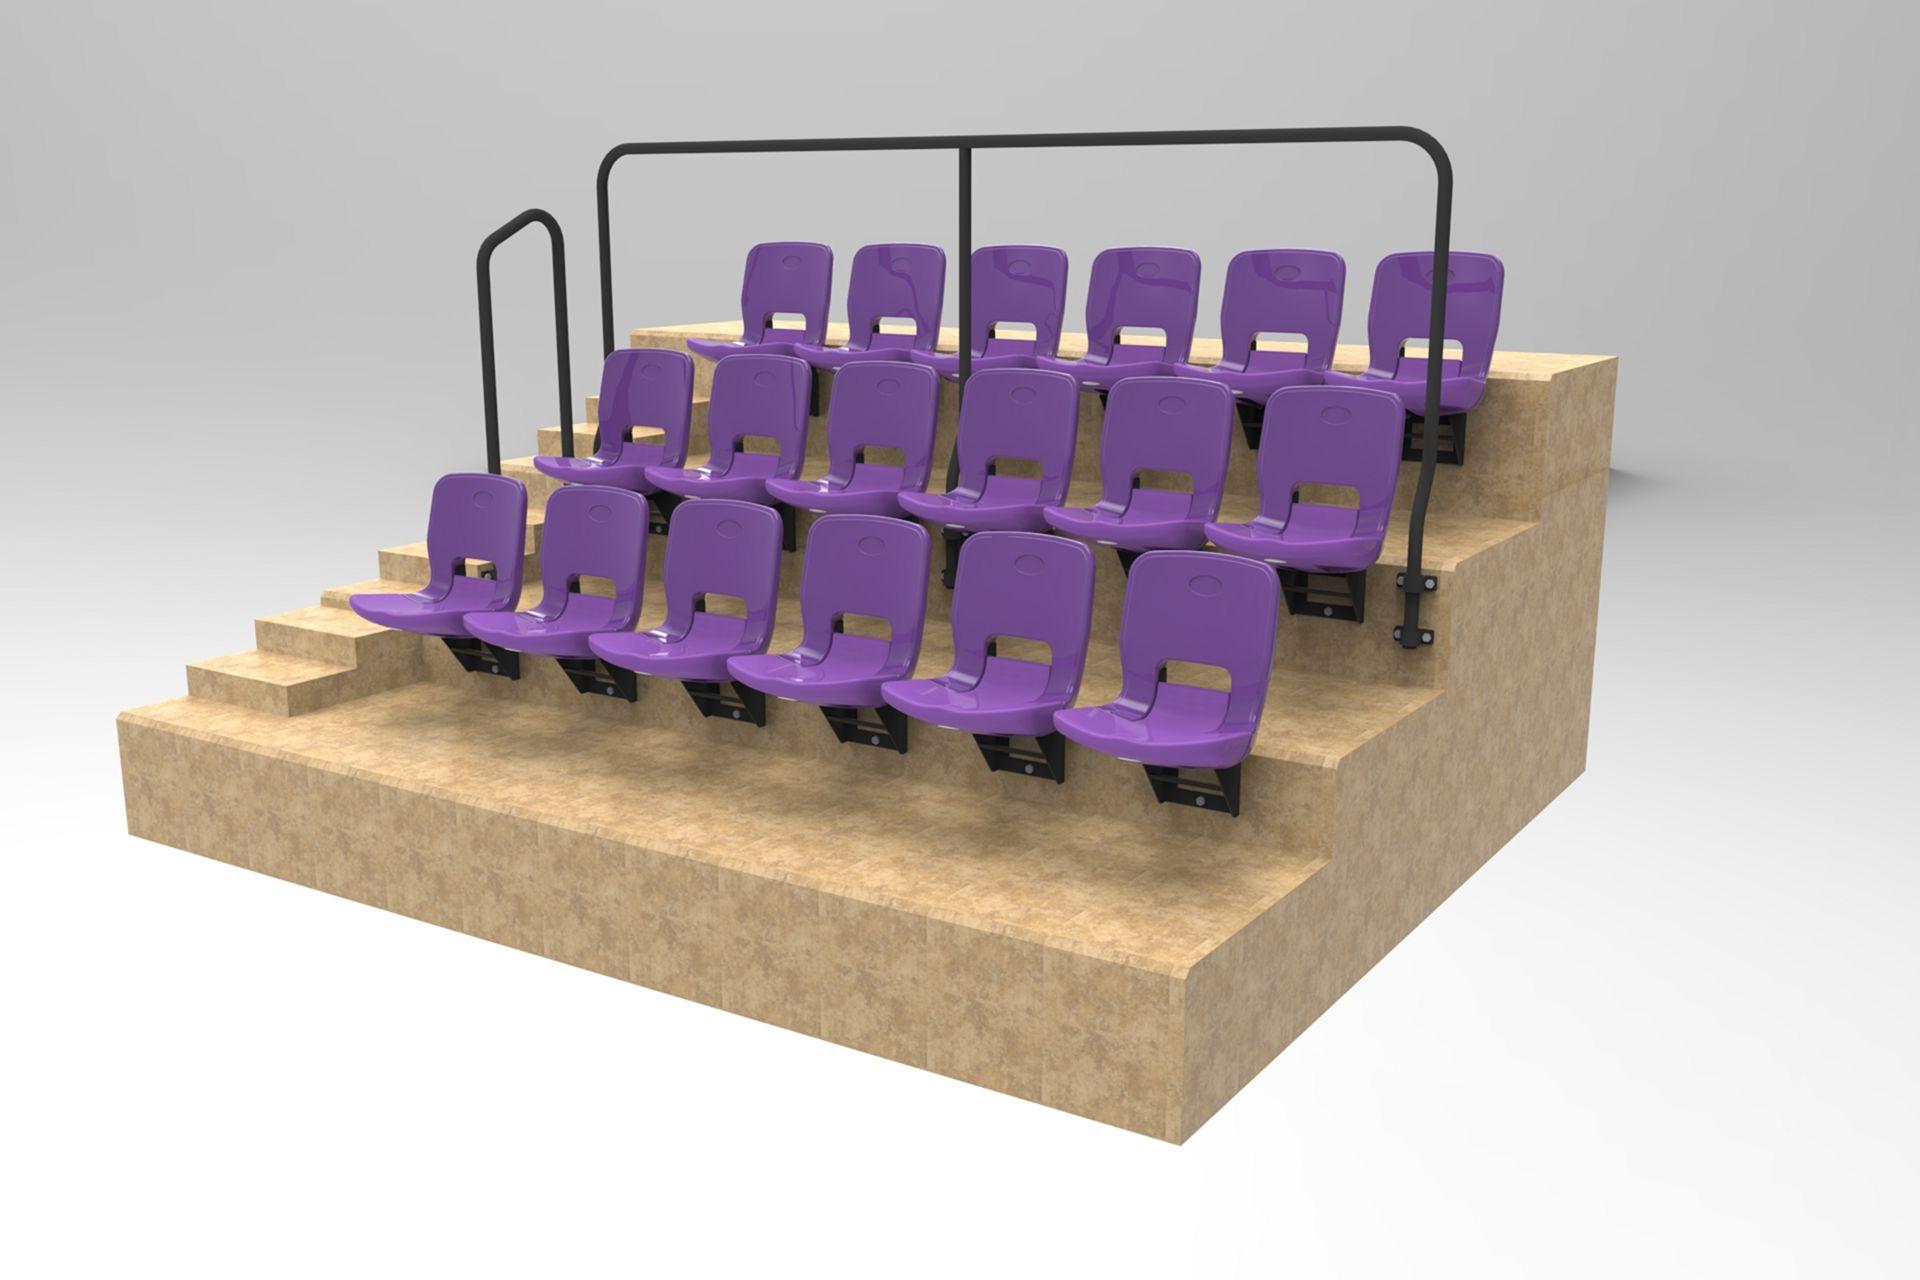 linea_backrest_monoblock_copolymer_pp_stadium_chair_seatorium_02